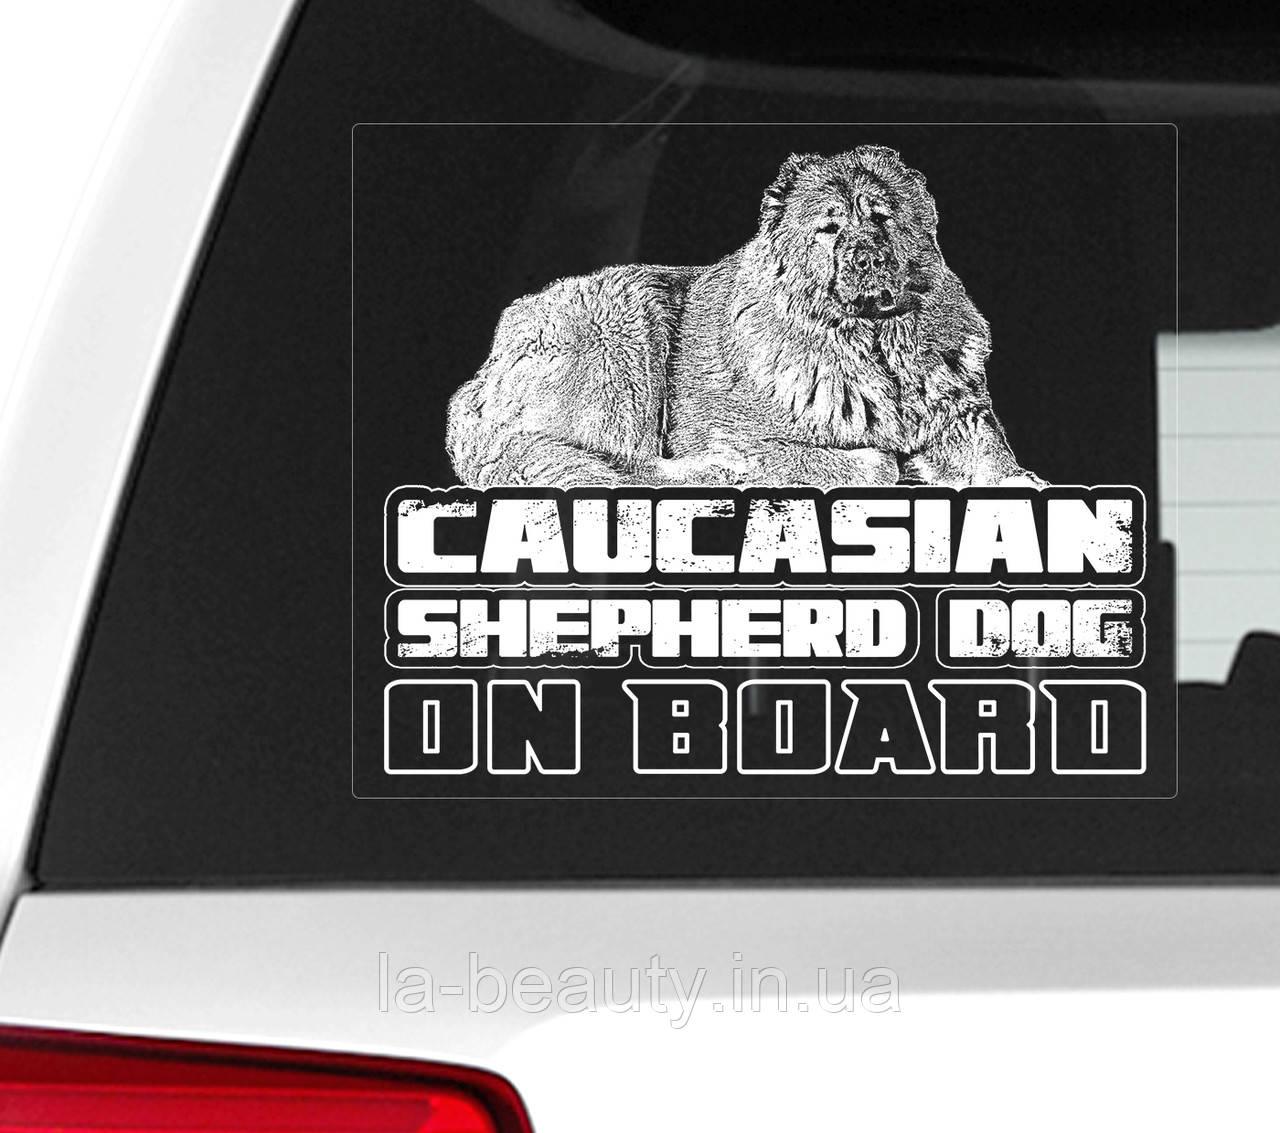 Наклейка на авто / машину Кавказская овчарка - 3 на борту